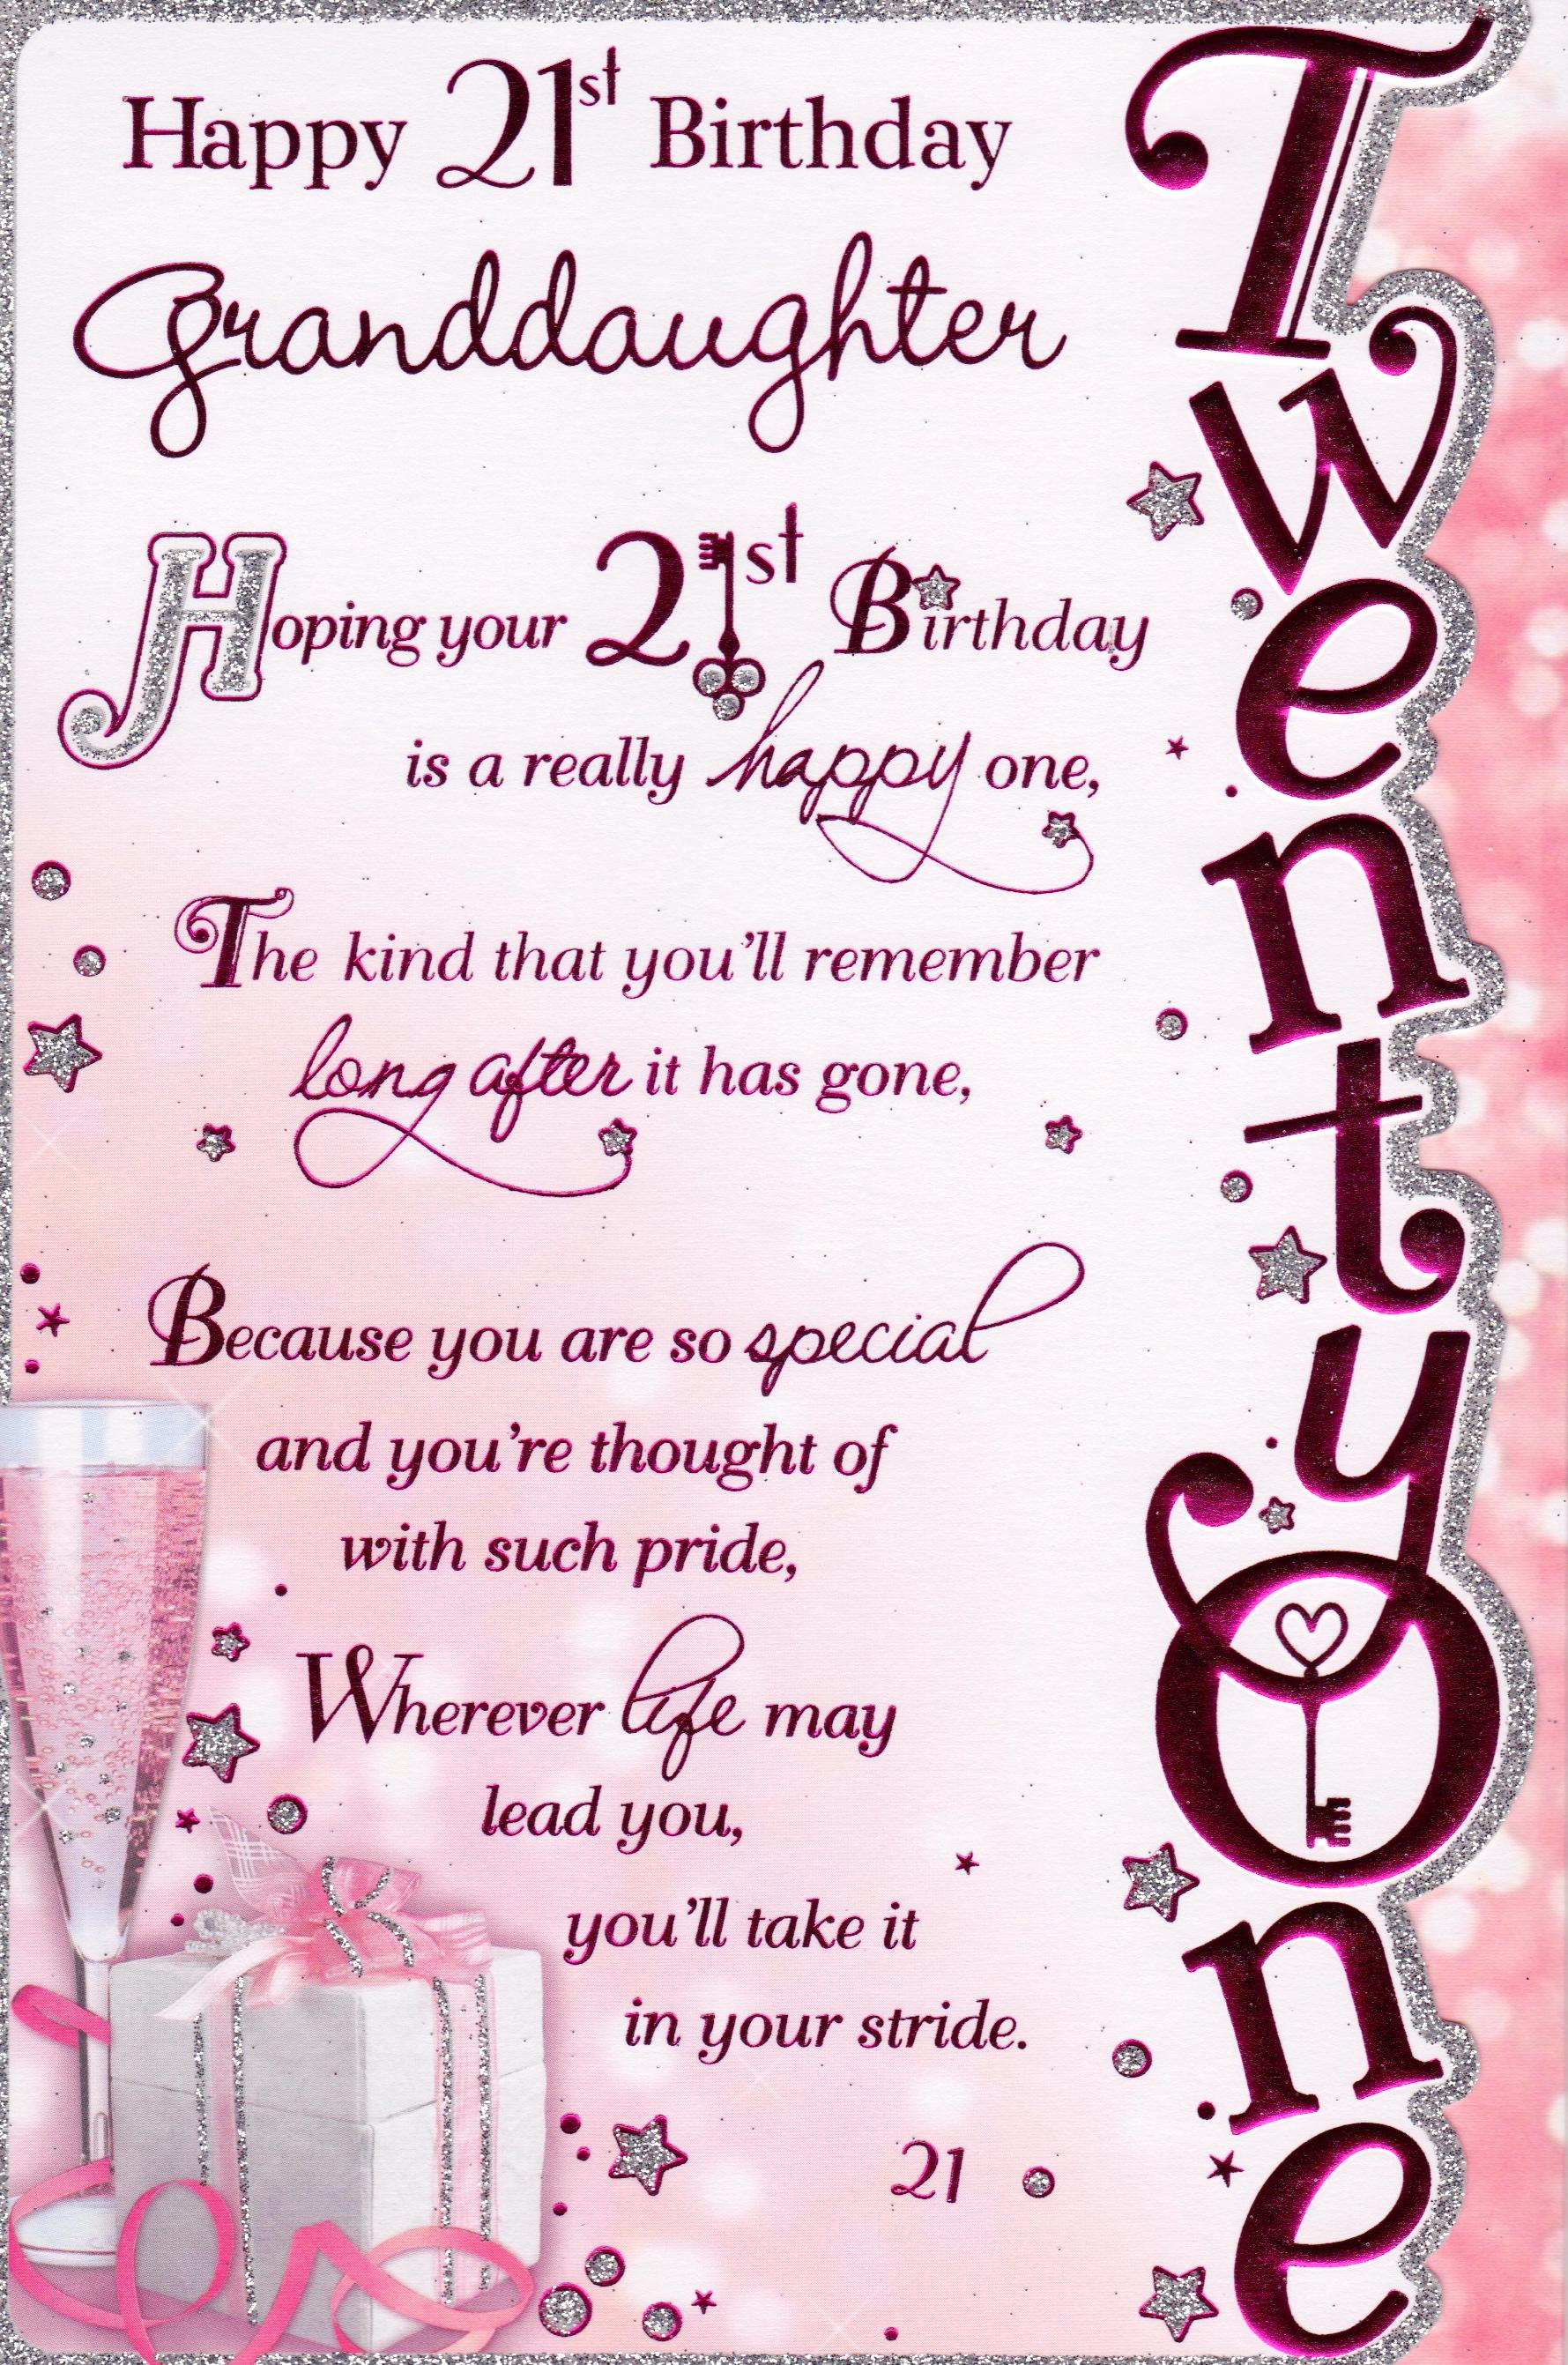 Happy 21st Birthday Wishes Quotes. QuotesGram